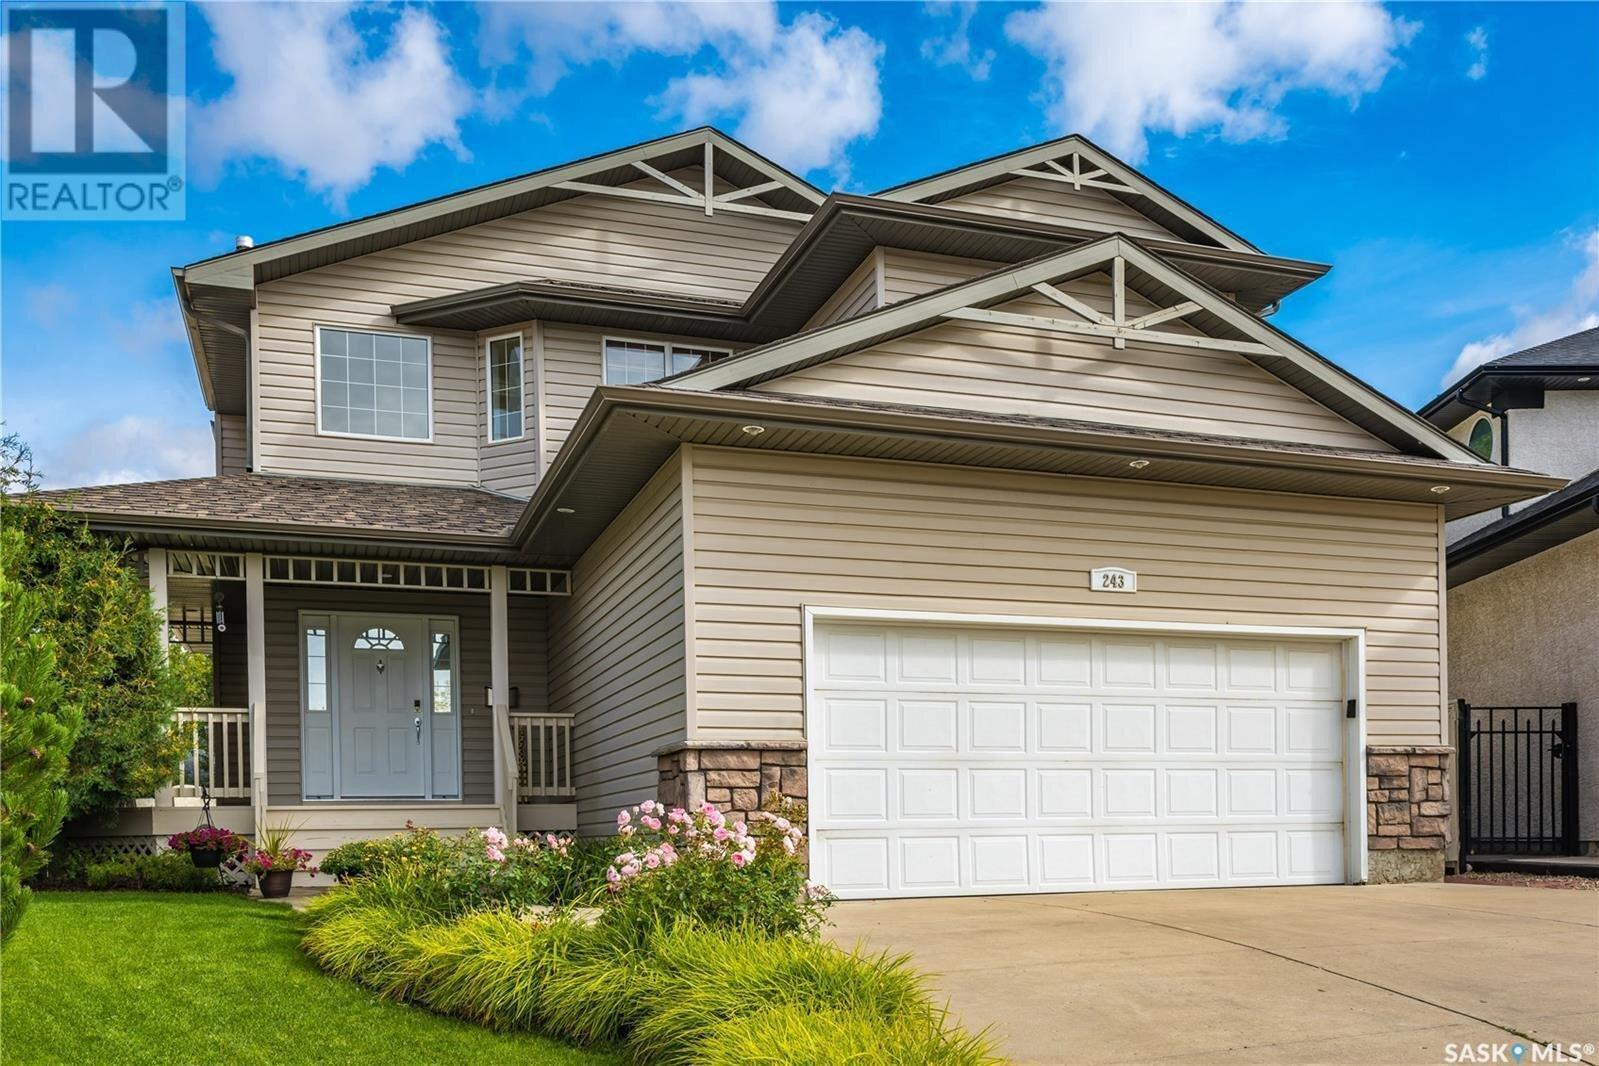 House for sale at 243 Kutz Cres Saskatoon Saskatchewan - MLS: SK833603